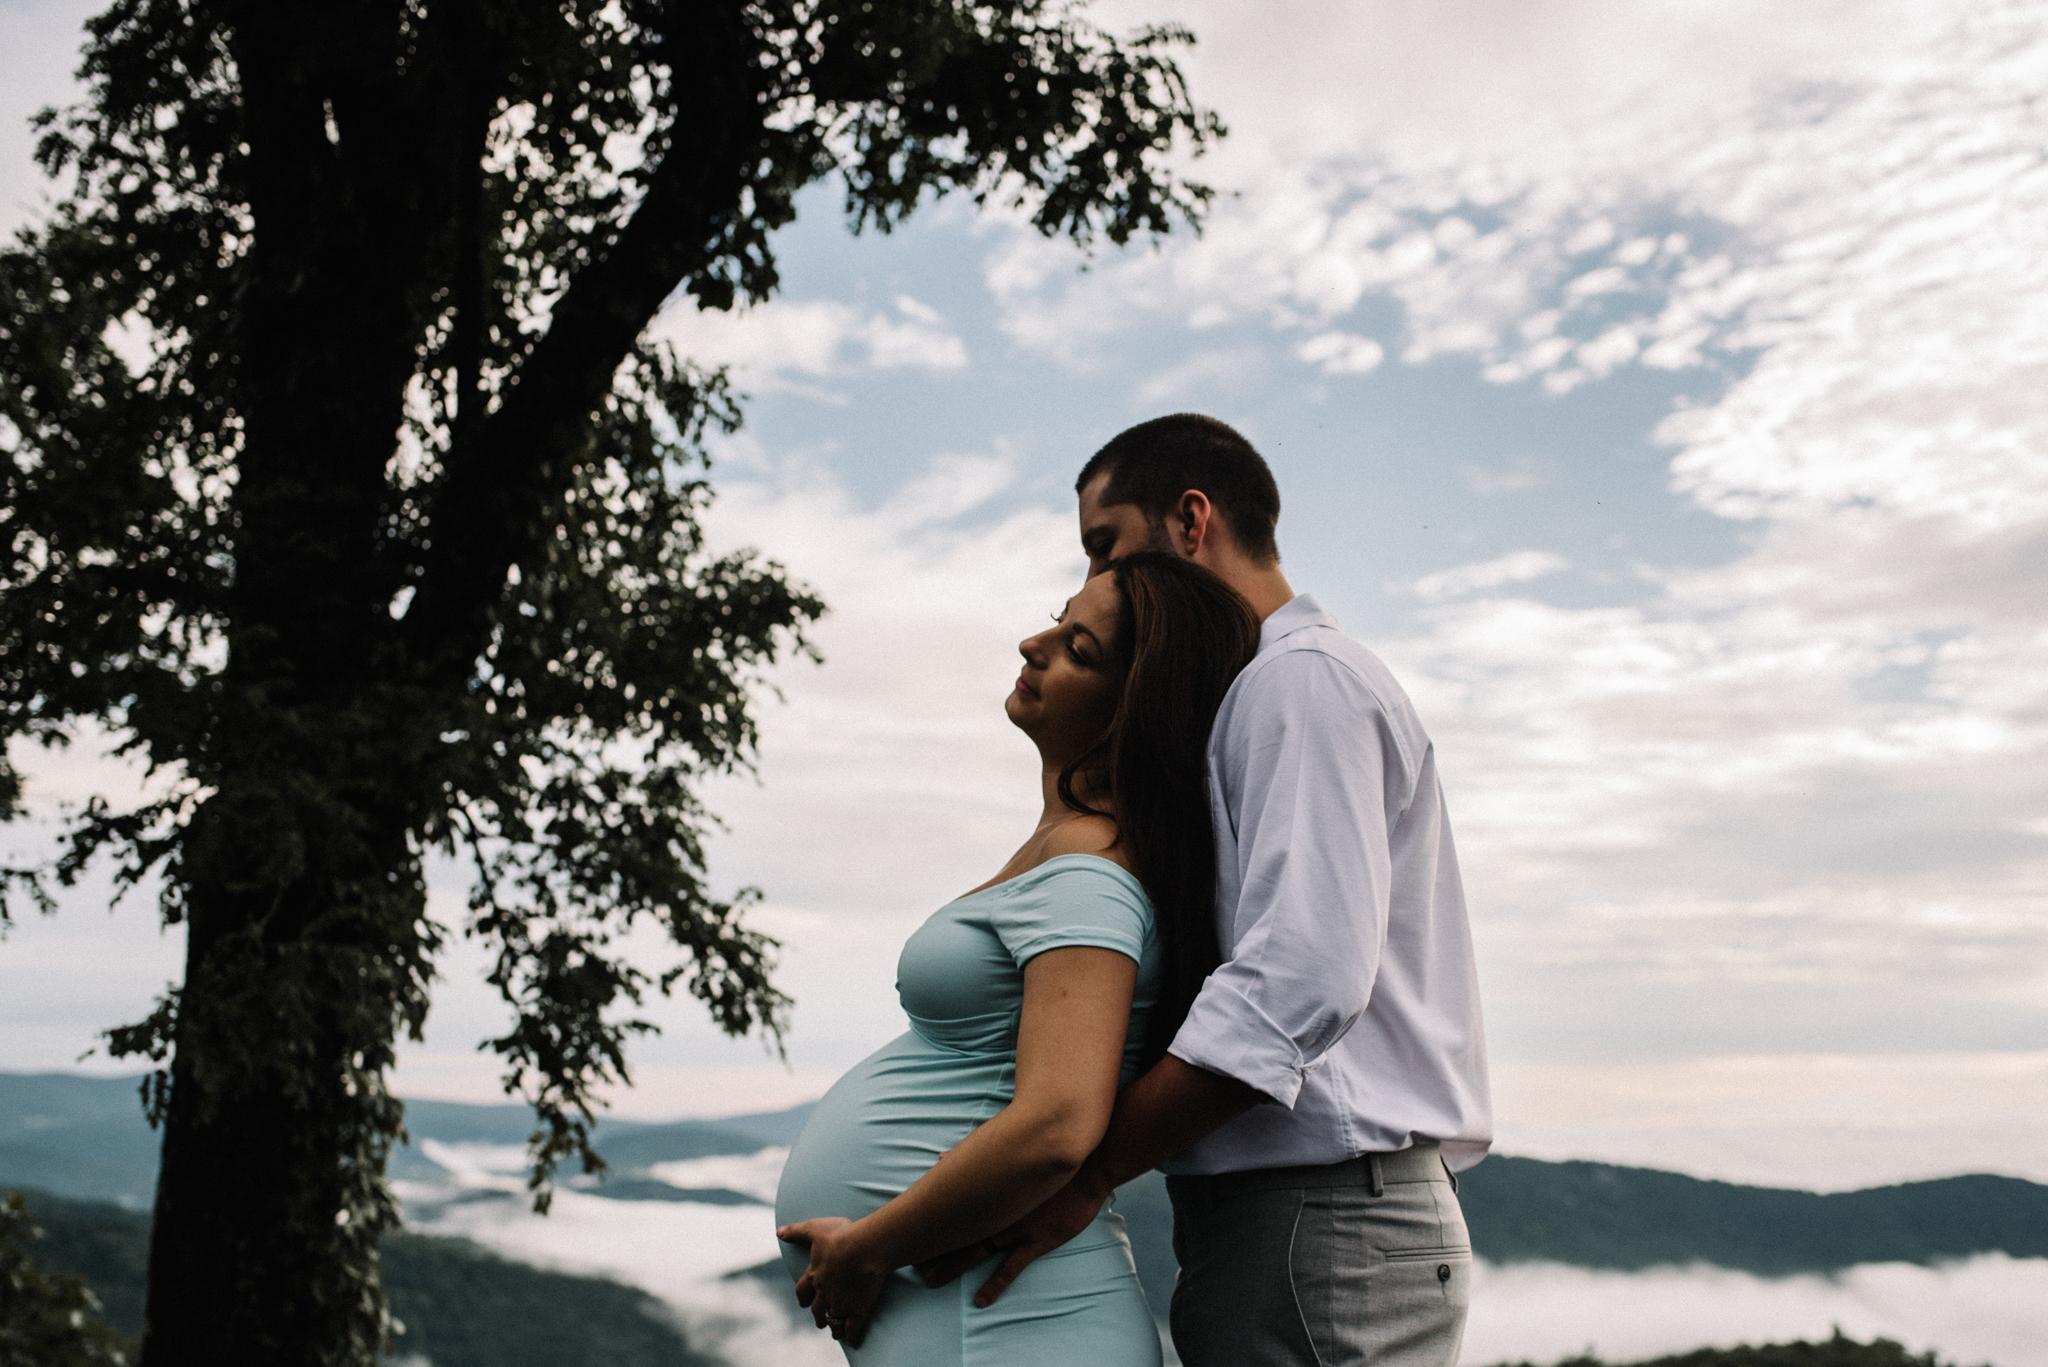 Mandy Spencer Maternity Sunrise Session Shenandoah National Park - White Sails Photography Creative_24.JPG